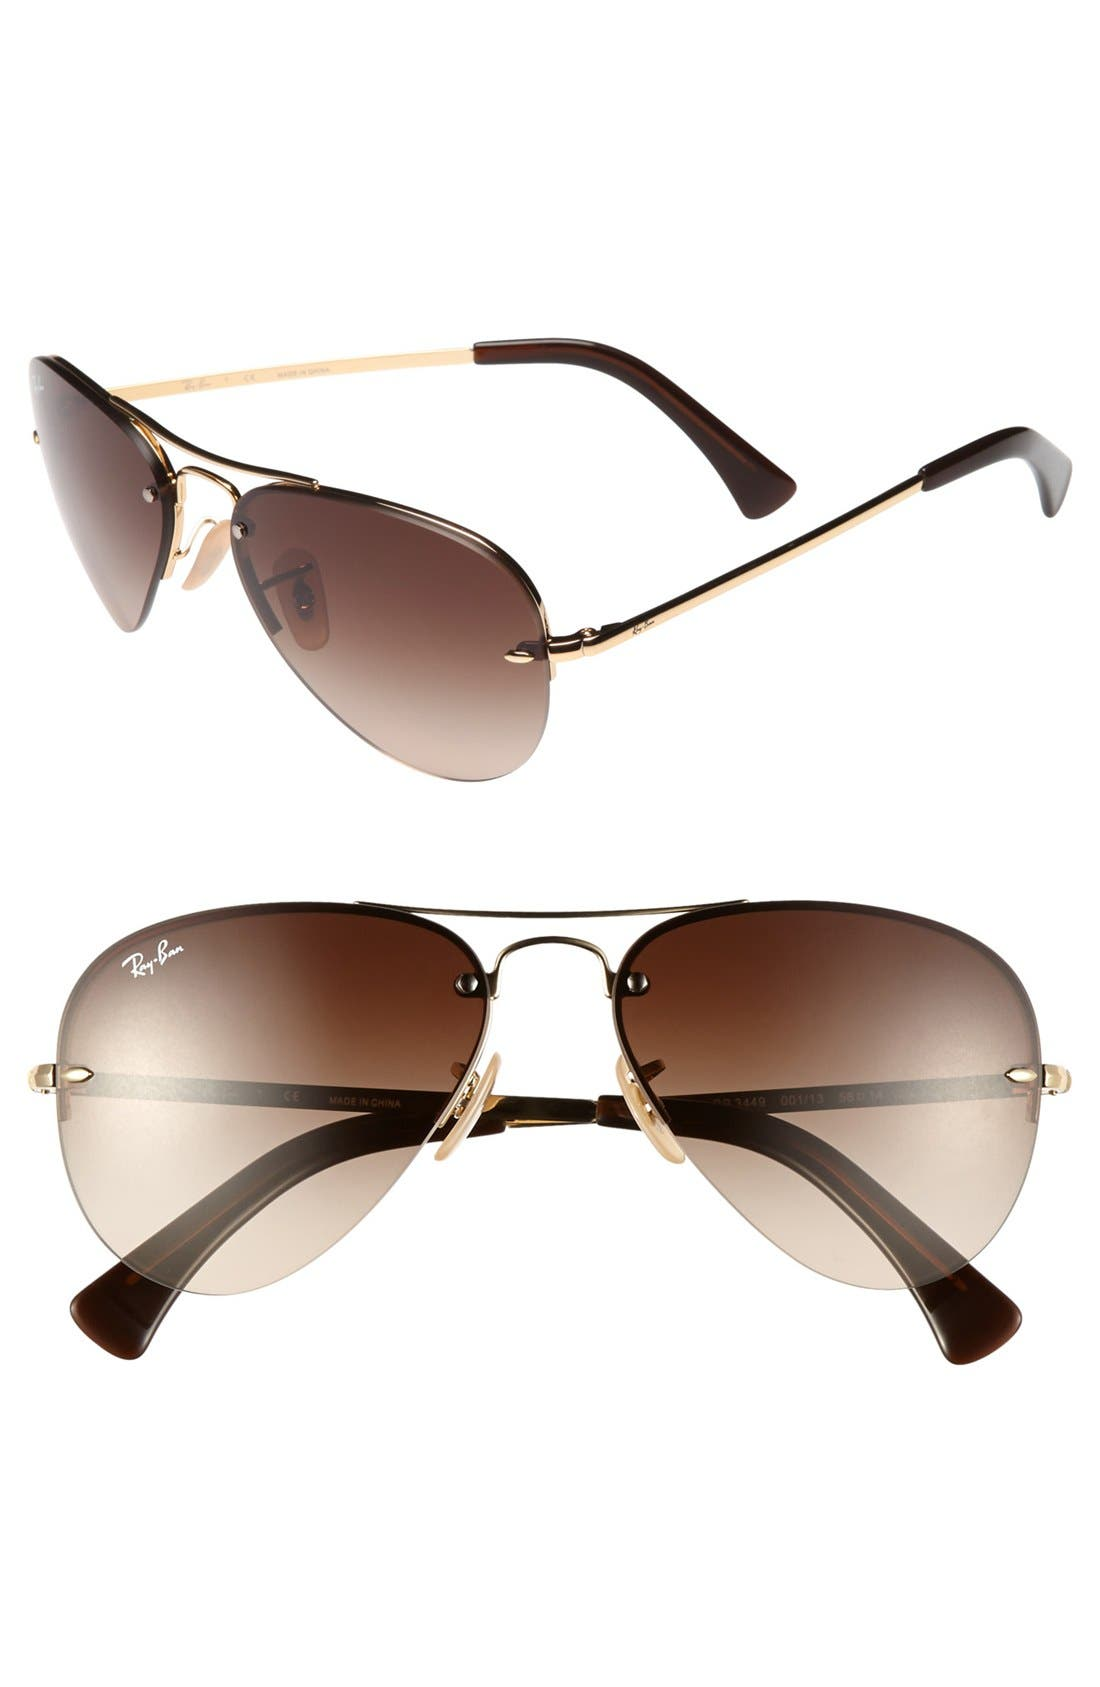 Main Image - Ray-Ban 56mm Rimless Aviator Sunglasses